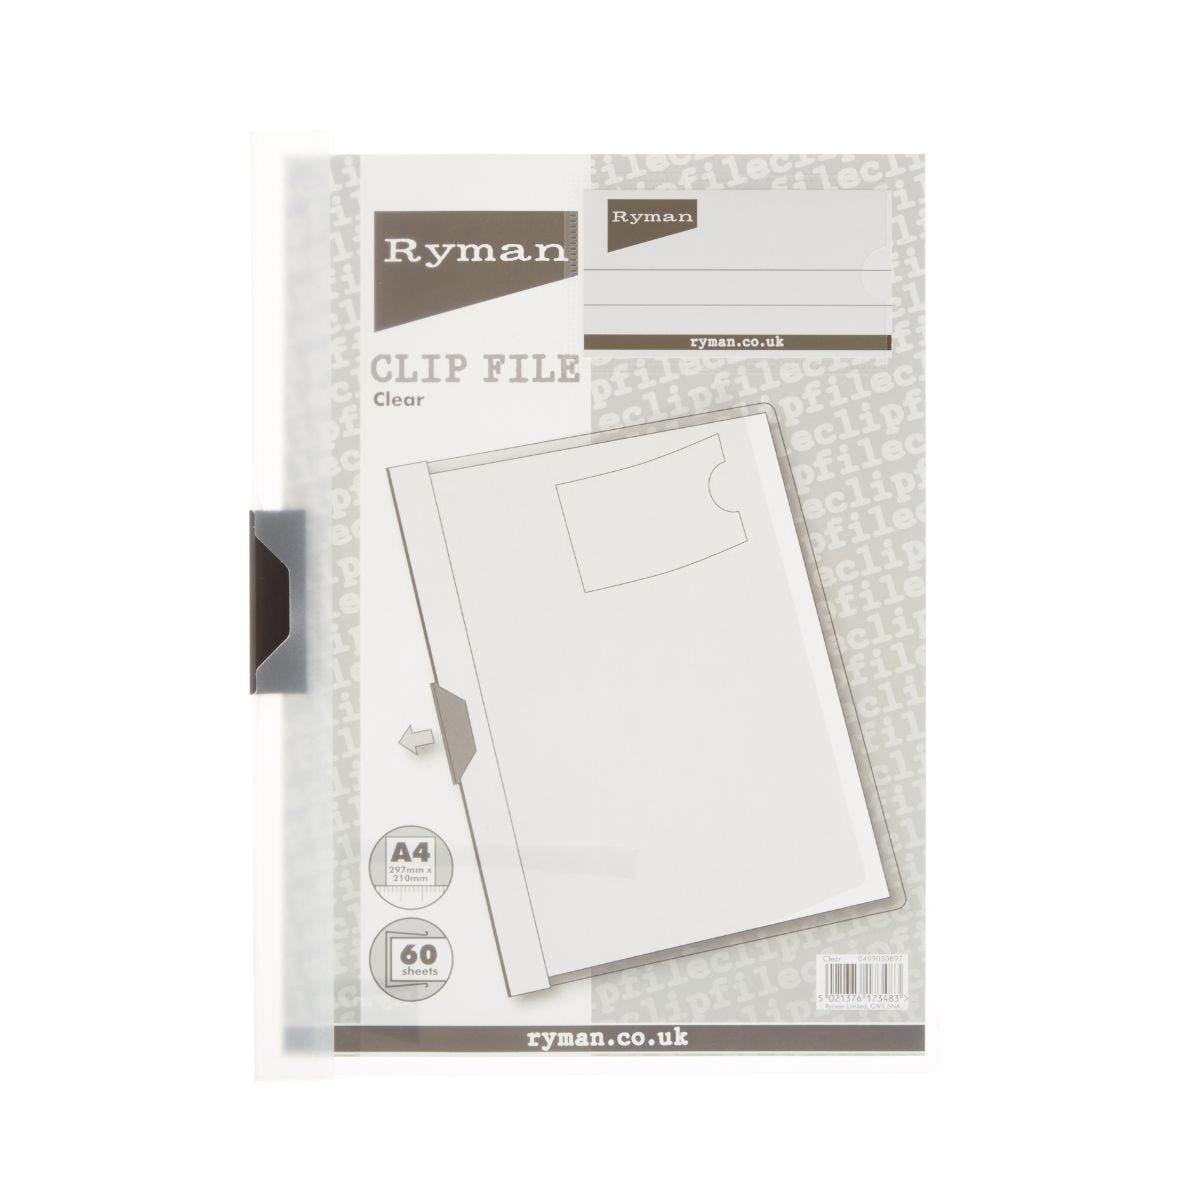 Ryman Clip File A4 60 Sheet